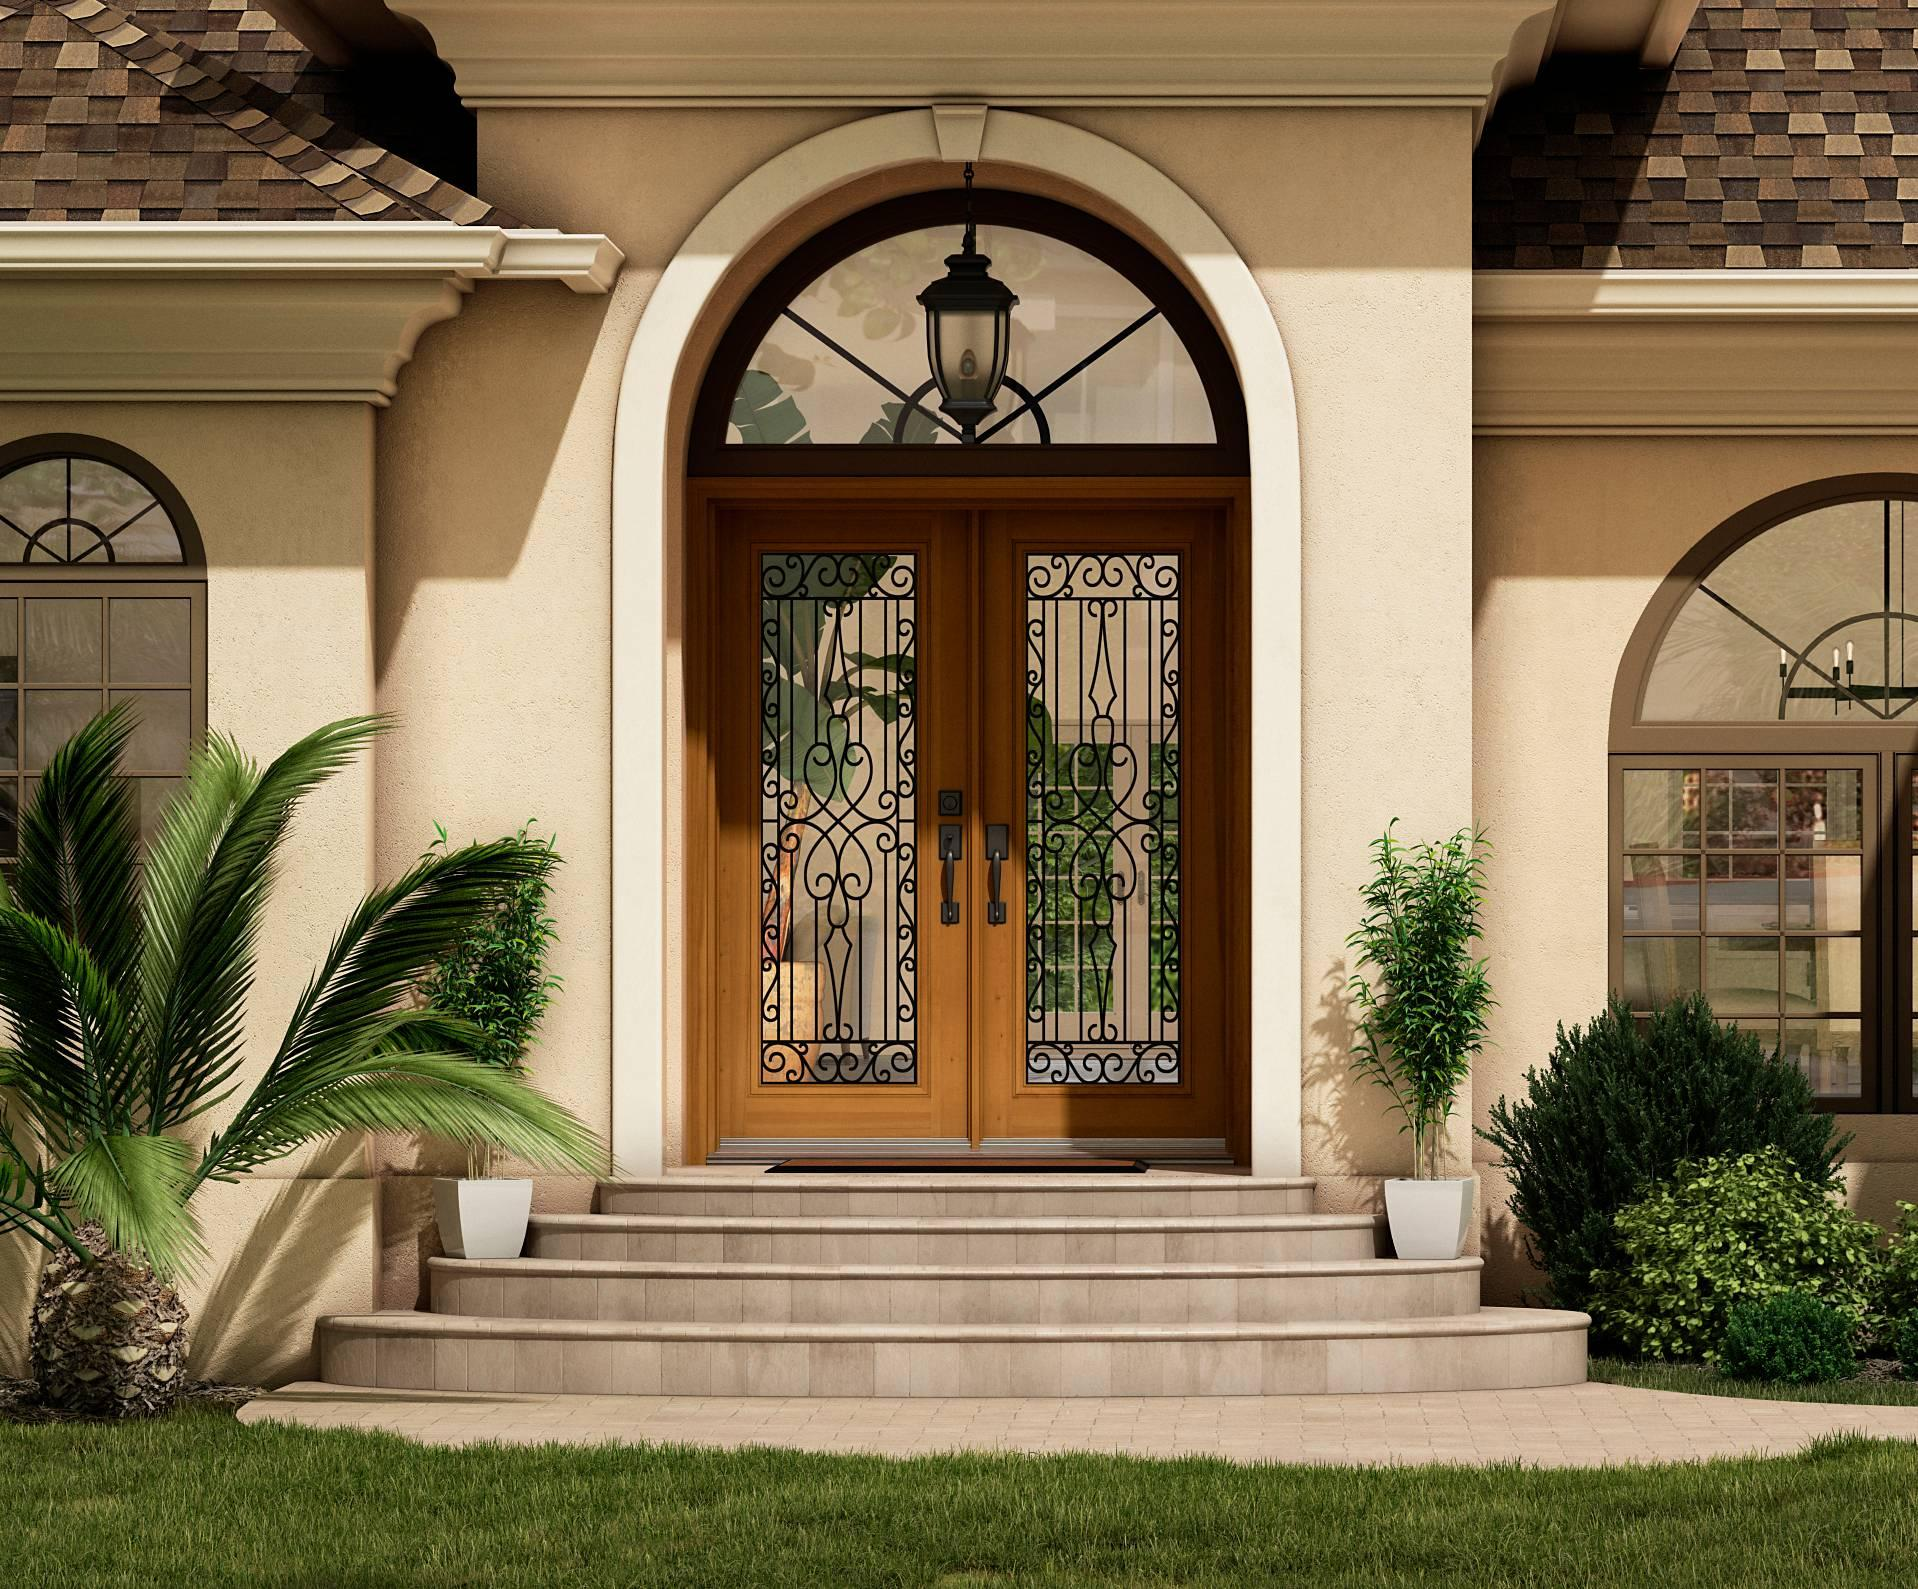 Florida Decorative Glass Door Edited Pixlr